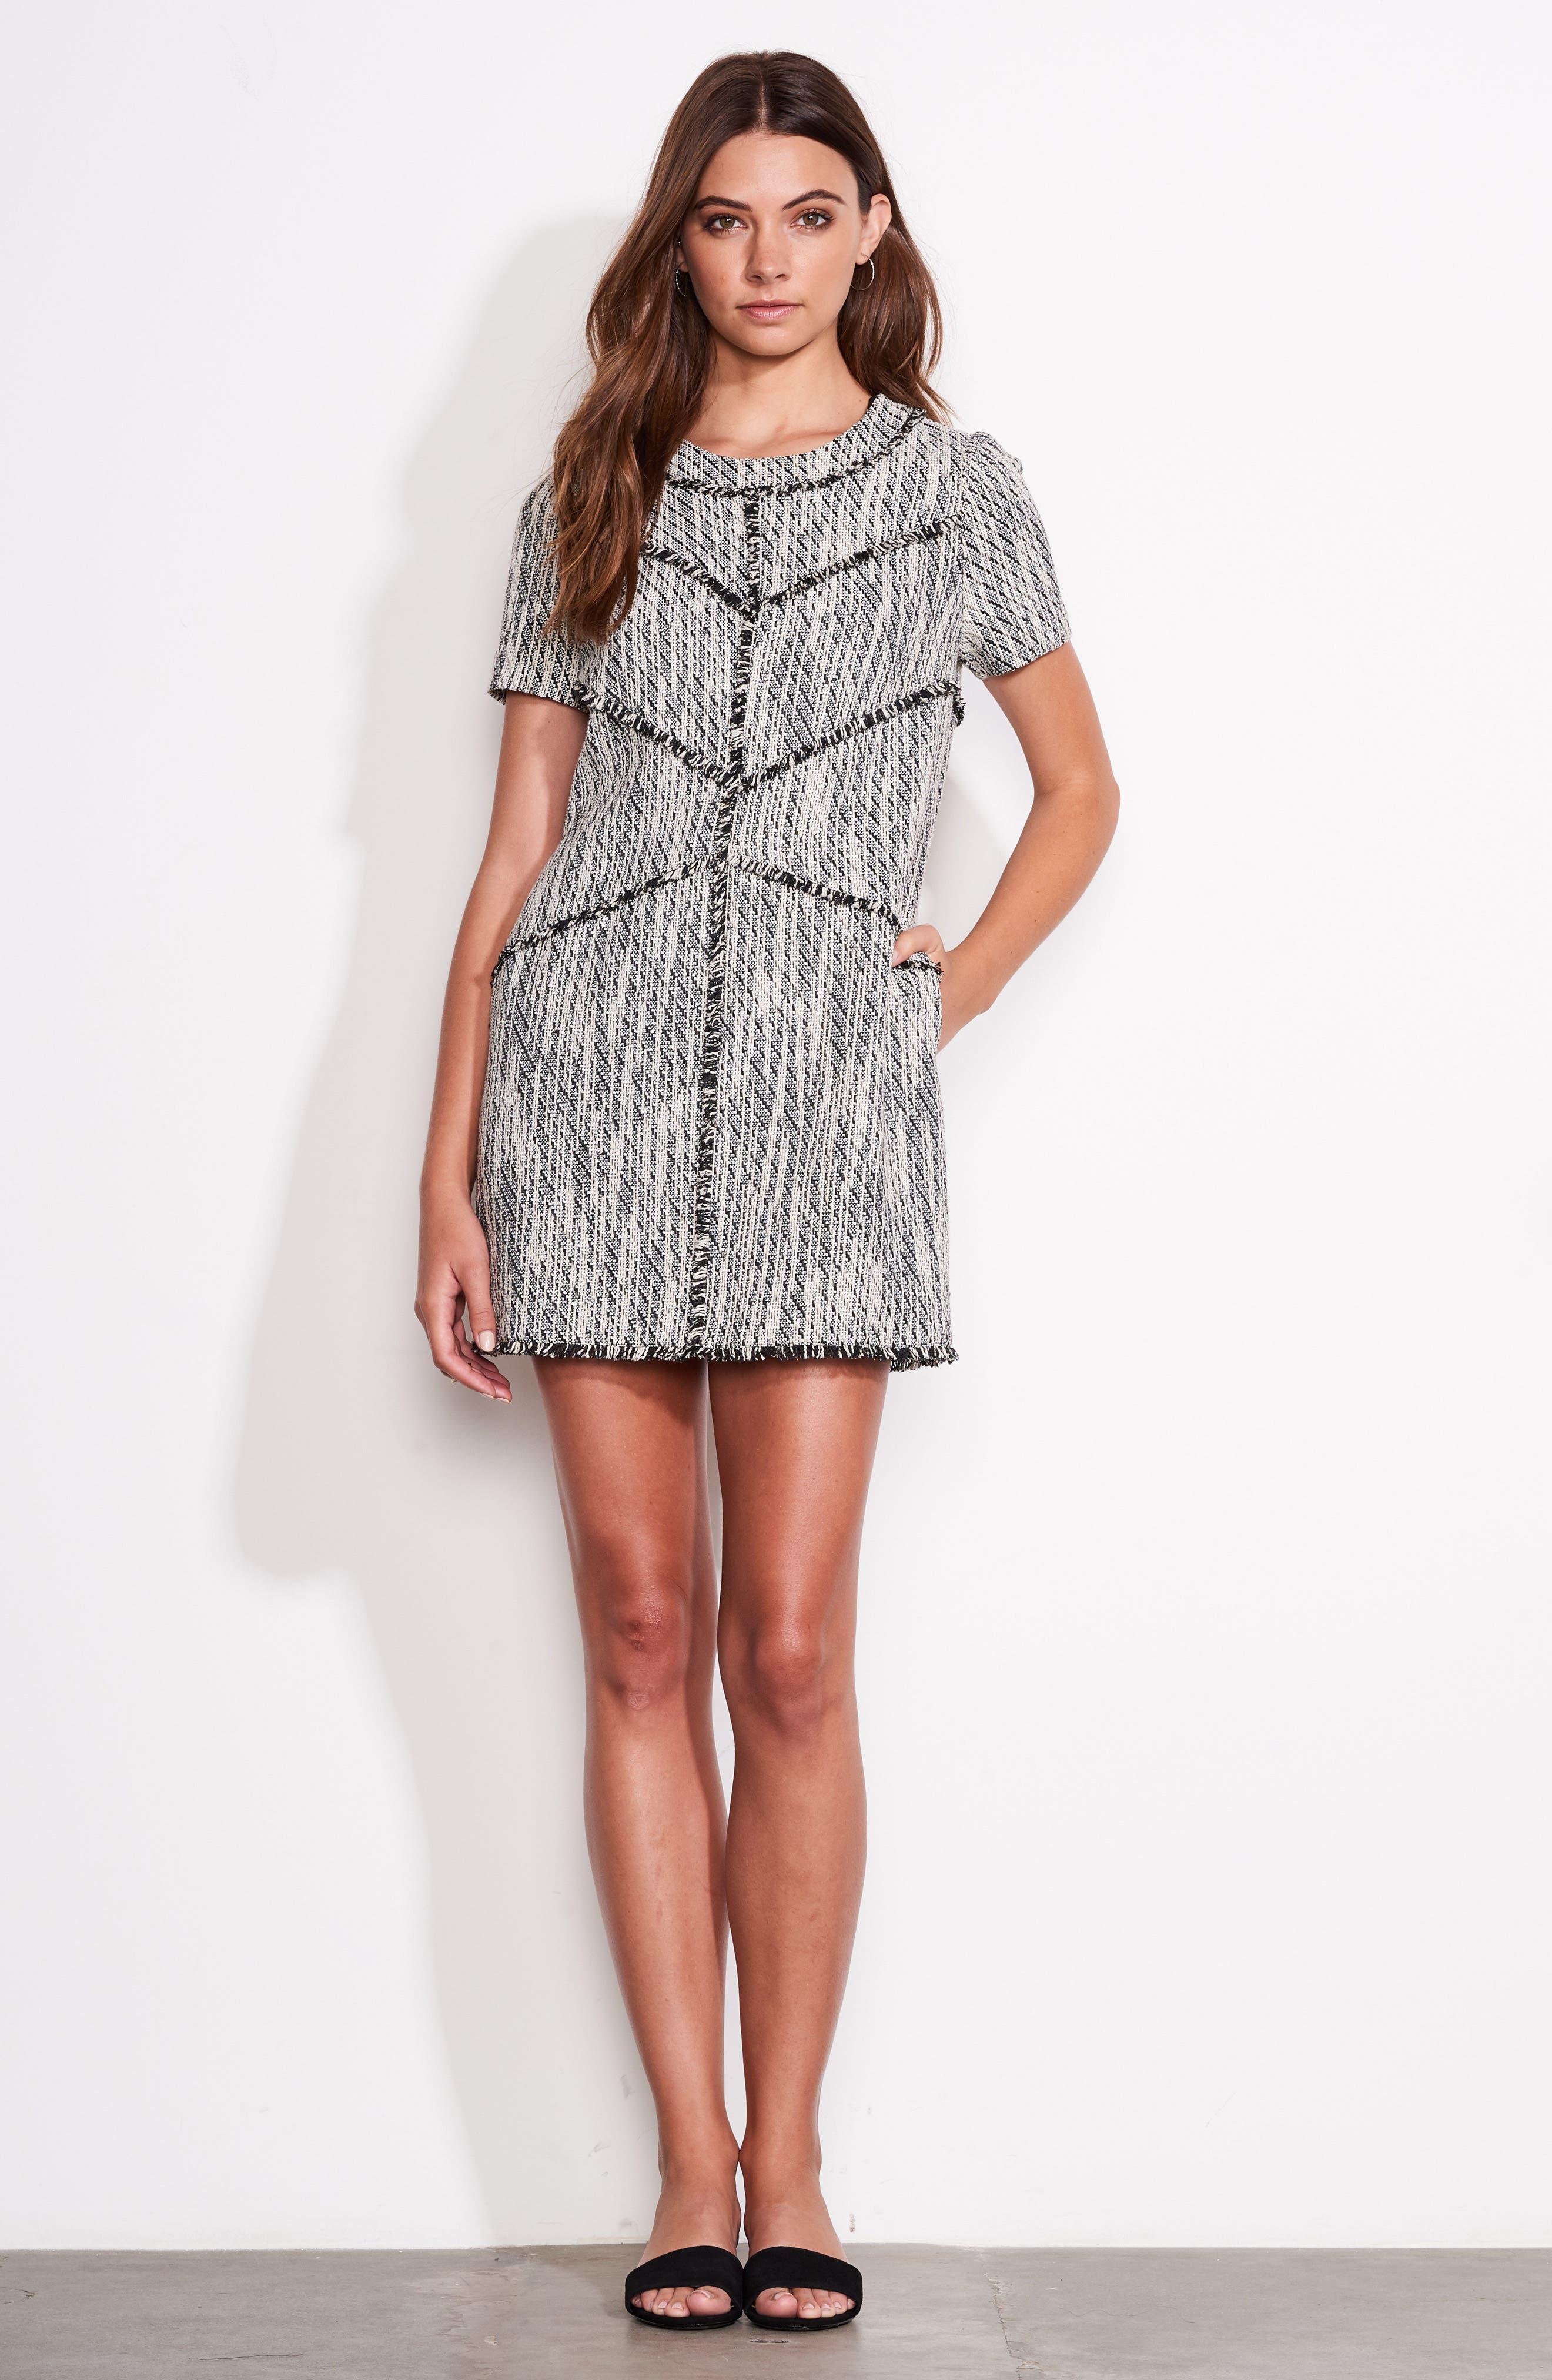 Dolce Vita Tweed Shift Dress,                             Alternate thumbnail 2, color,                             Black/ Ivory Tweed